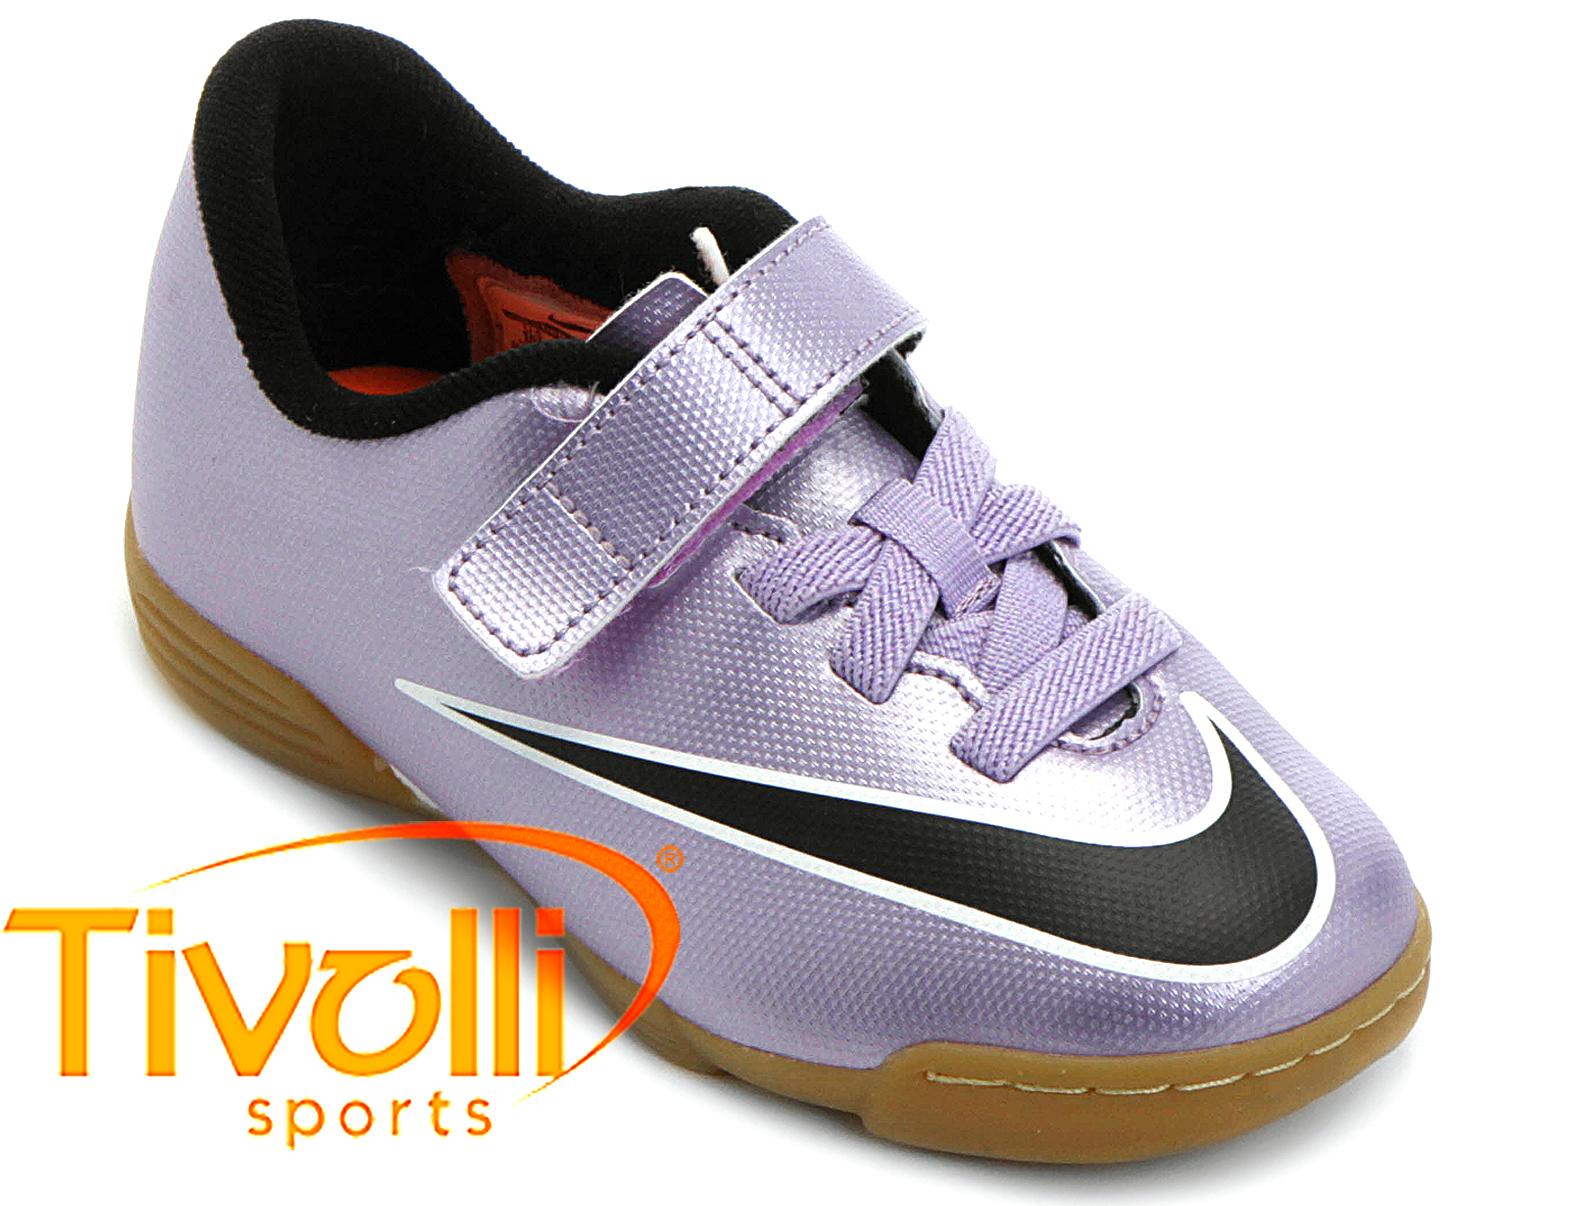 4286857aa5 Chuteira Nike Mercurial Vortex II (V) IC Futsal Infantil